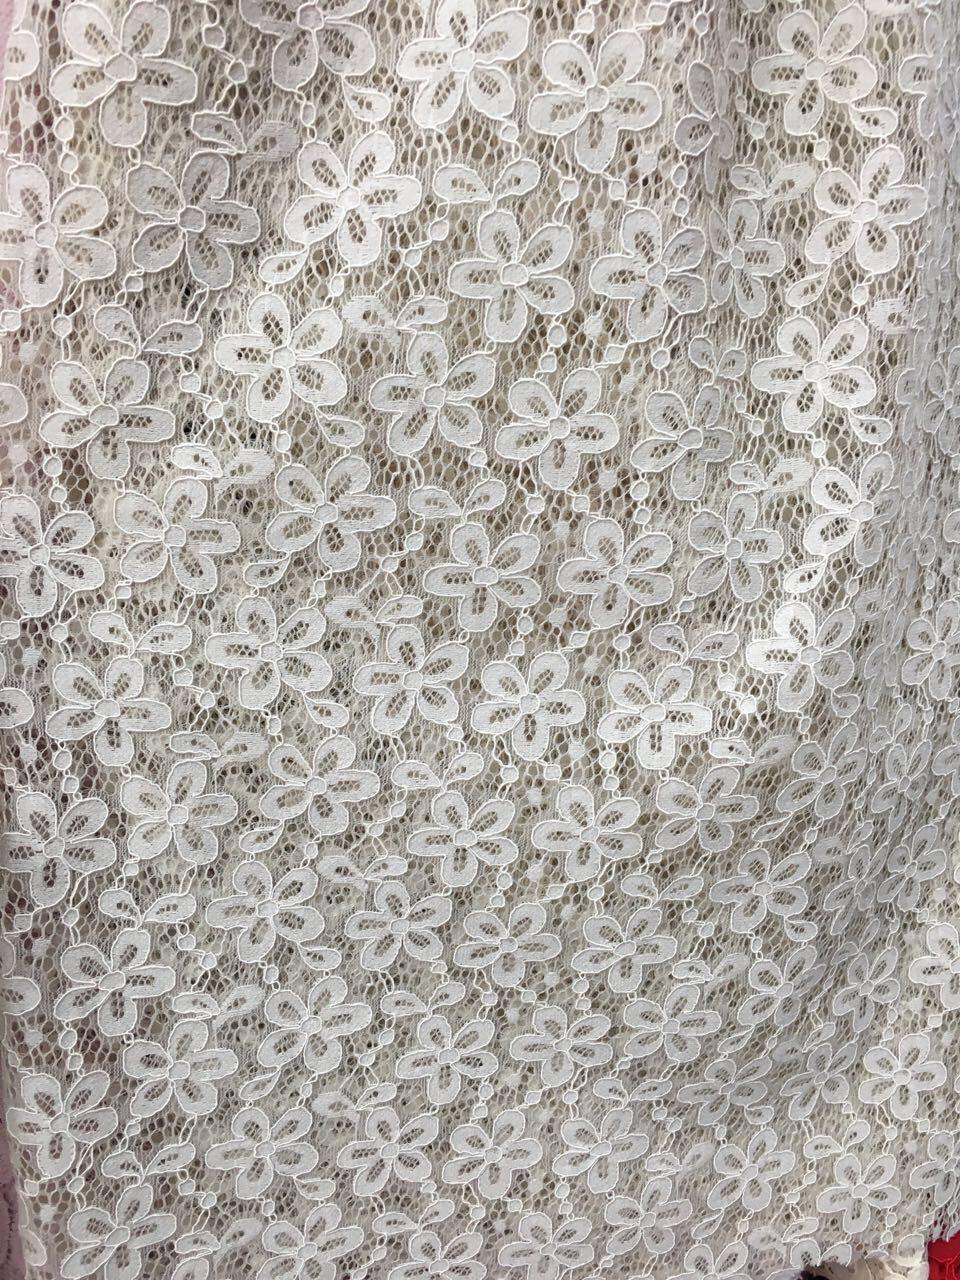 Jacquared Nylon Lace Lingerie Lace Fabric